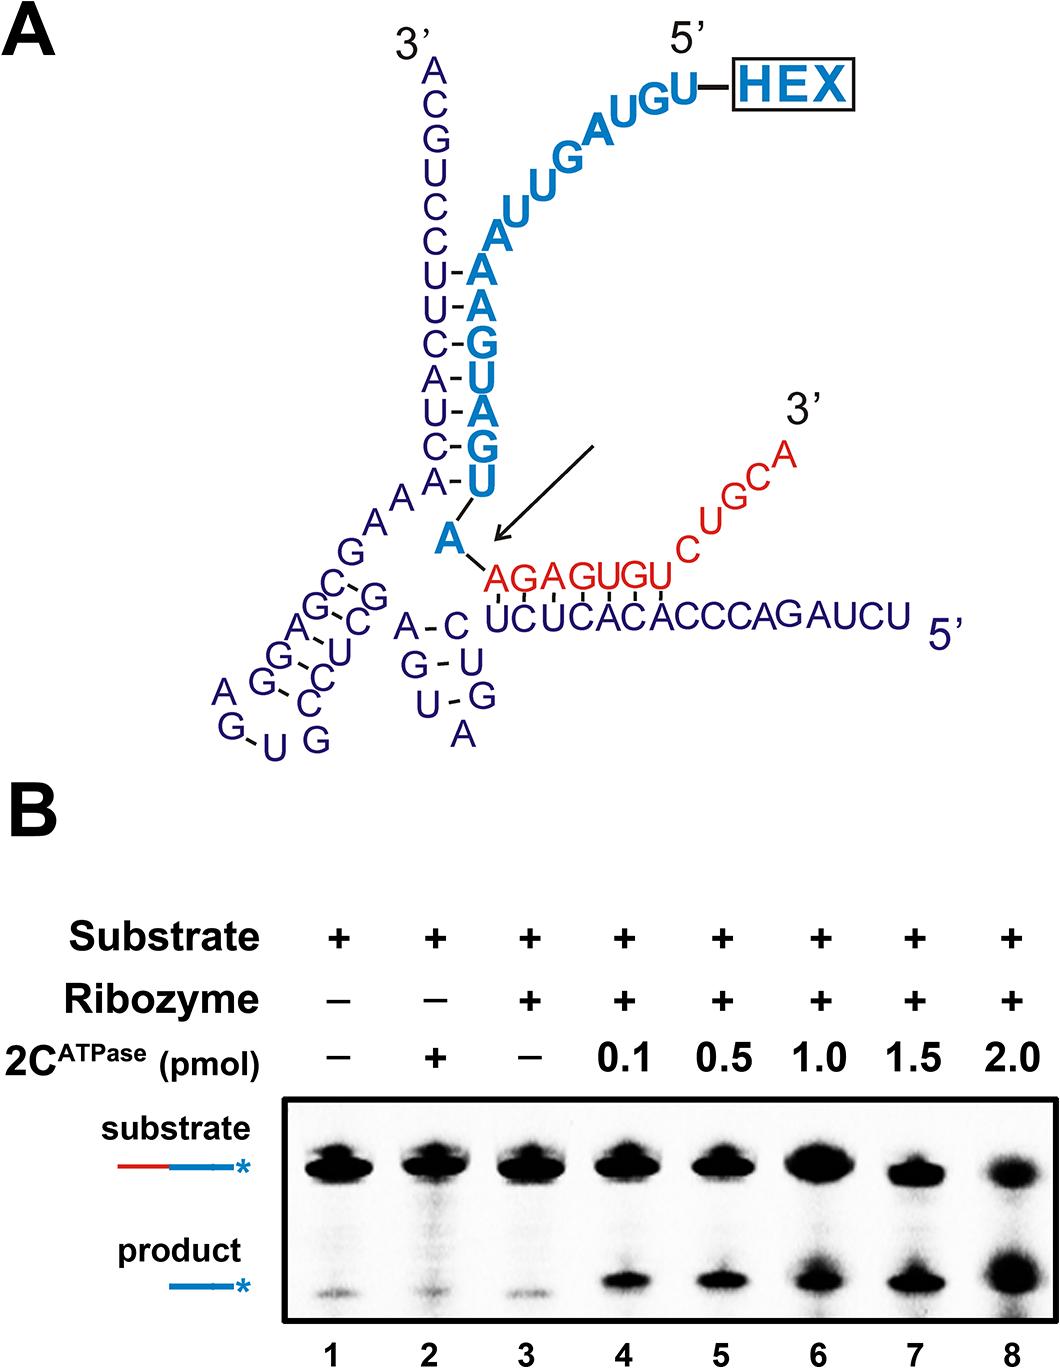 2C<sup>ATPase</sup> enhances hammerhead ribozyme activity.